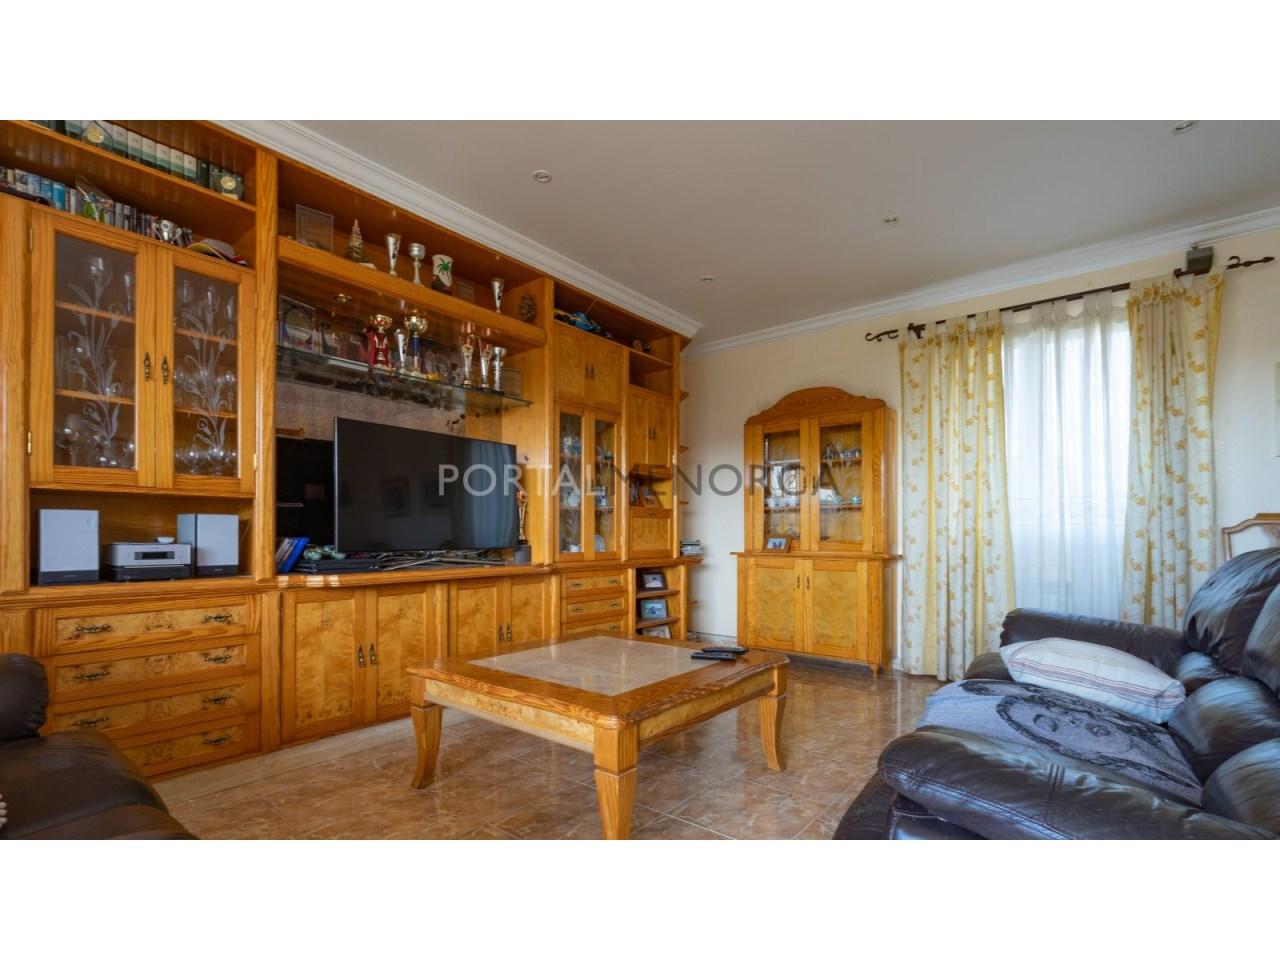 buy-house-alaior-menorca (1)